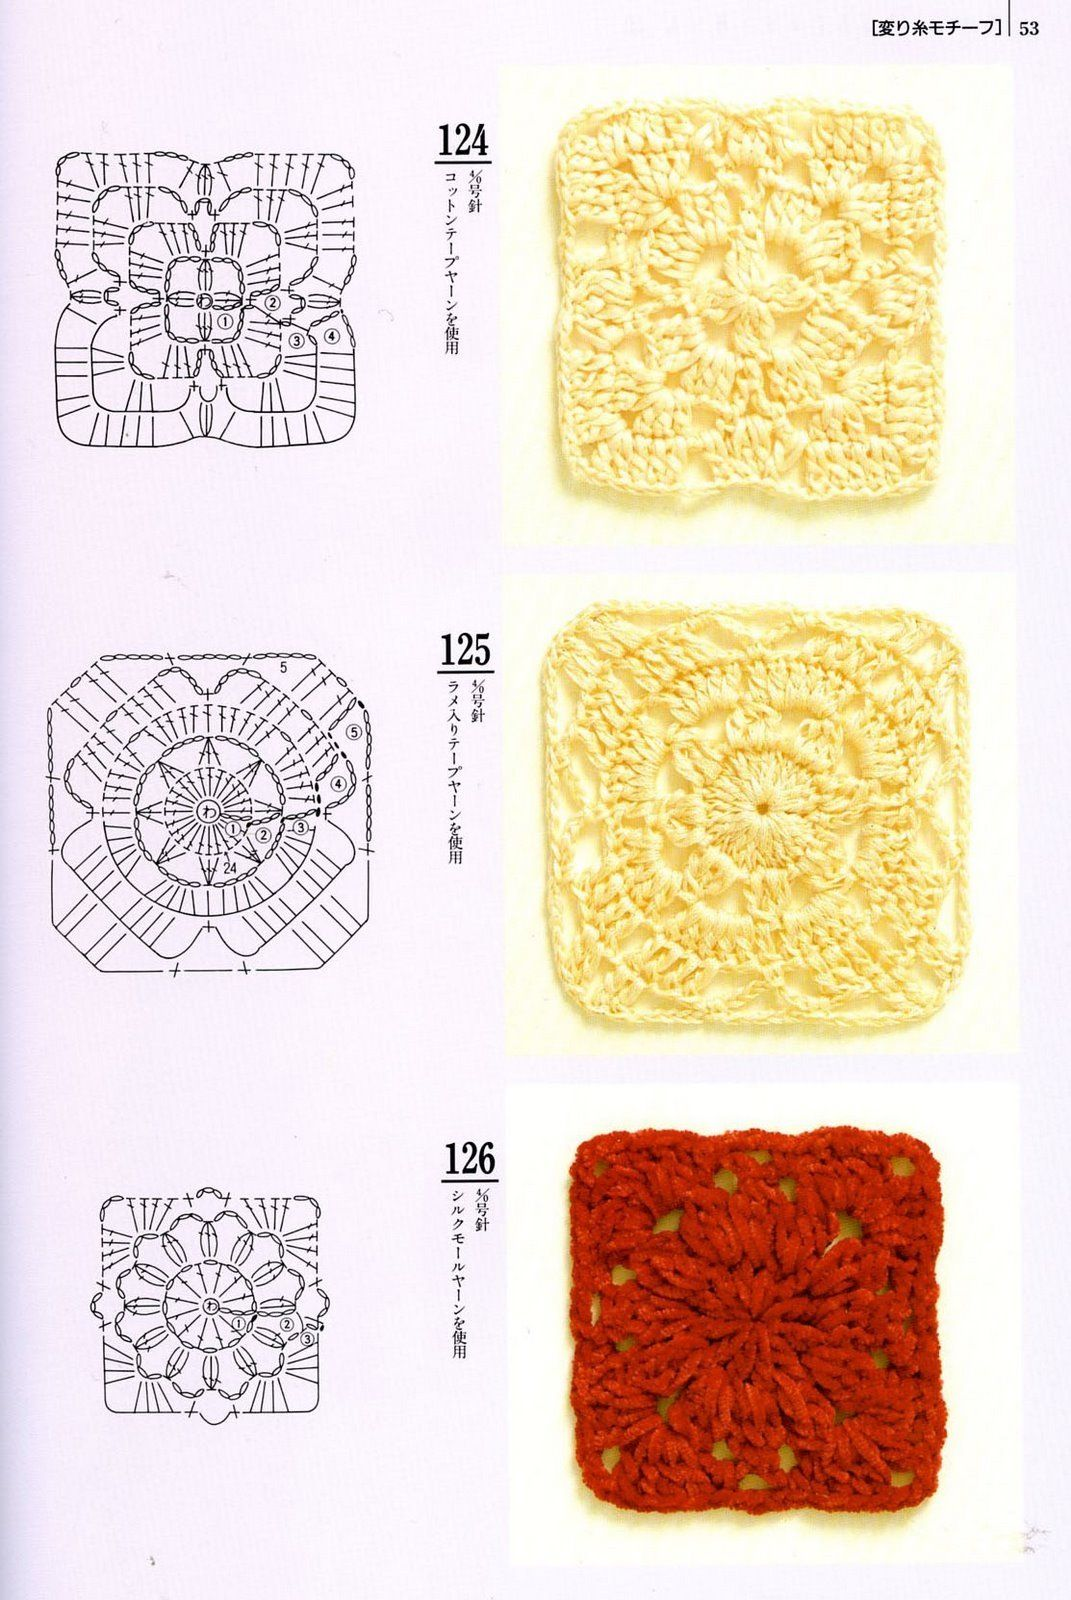 crochet granny square diagram 69 firebird wiring squares cuadrados a patrones tejedorita